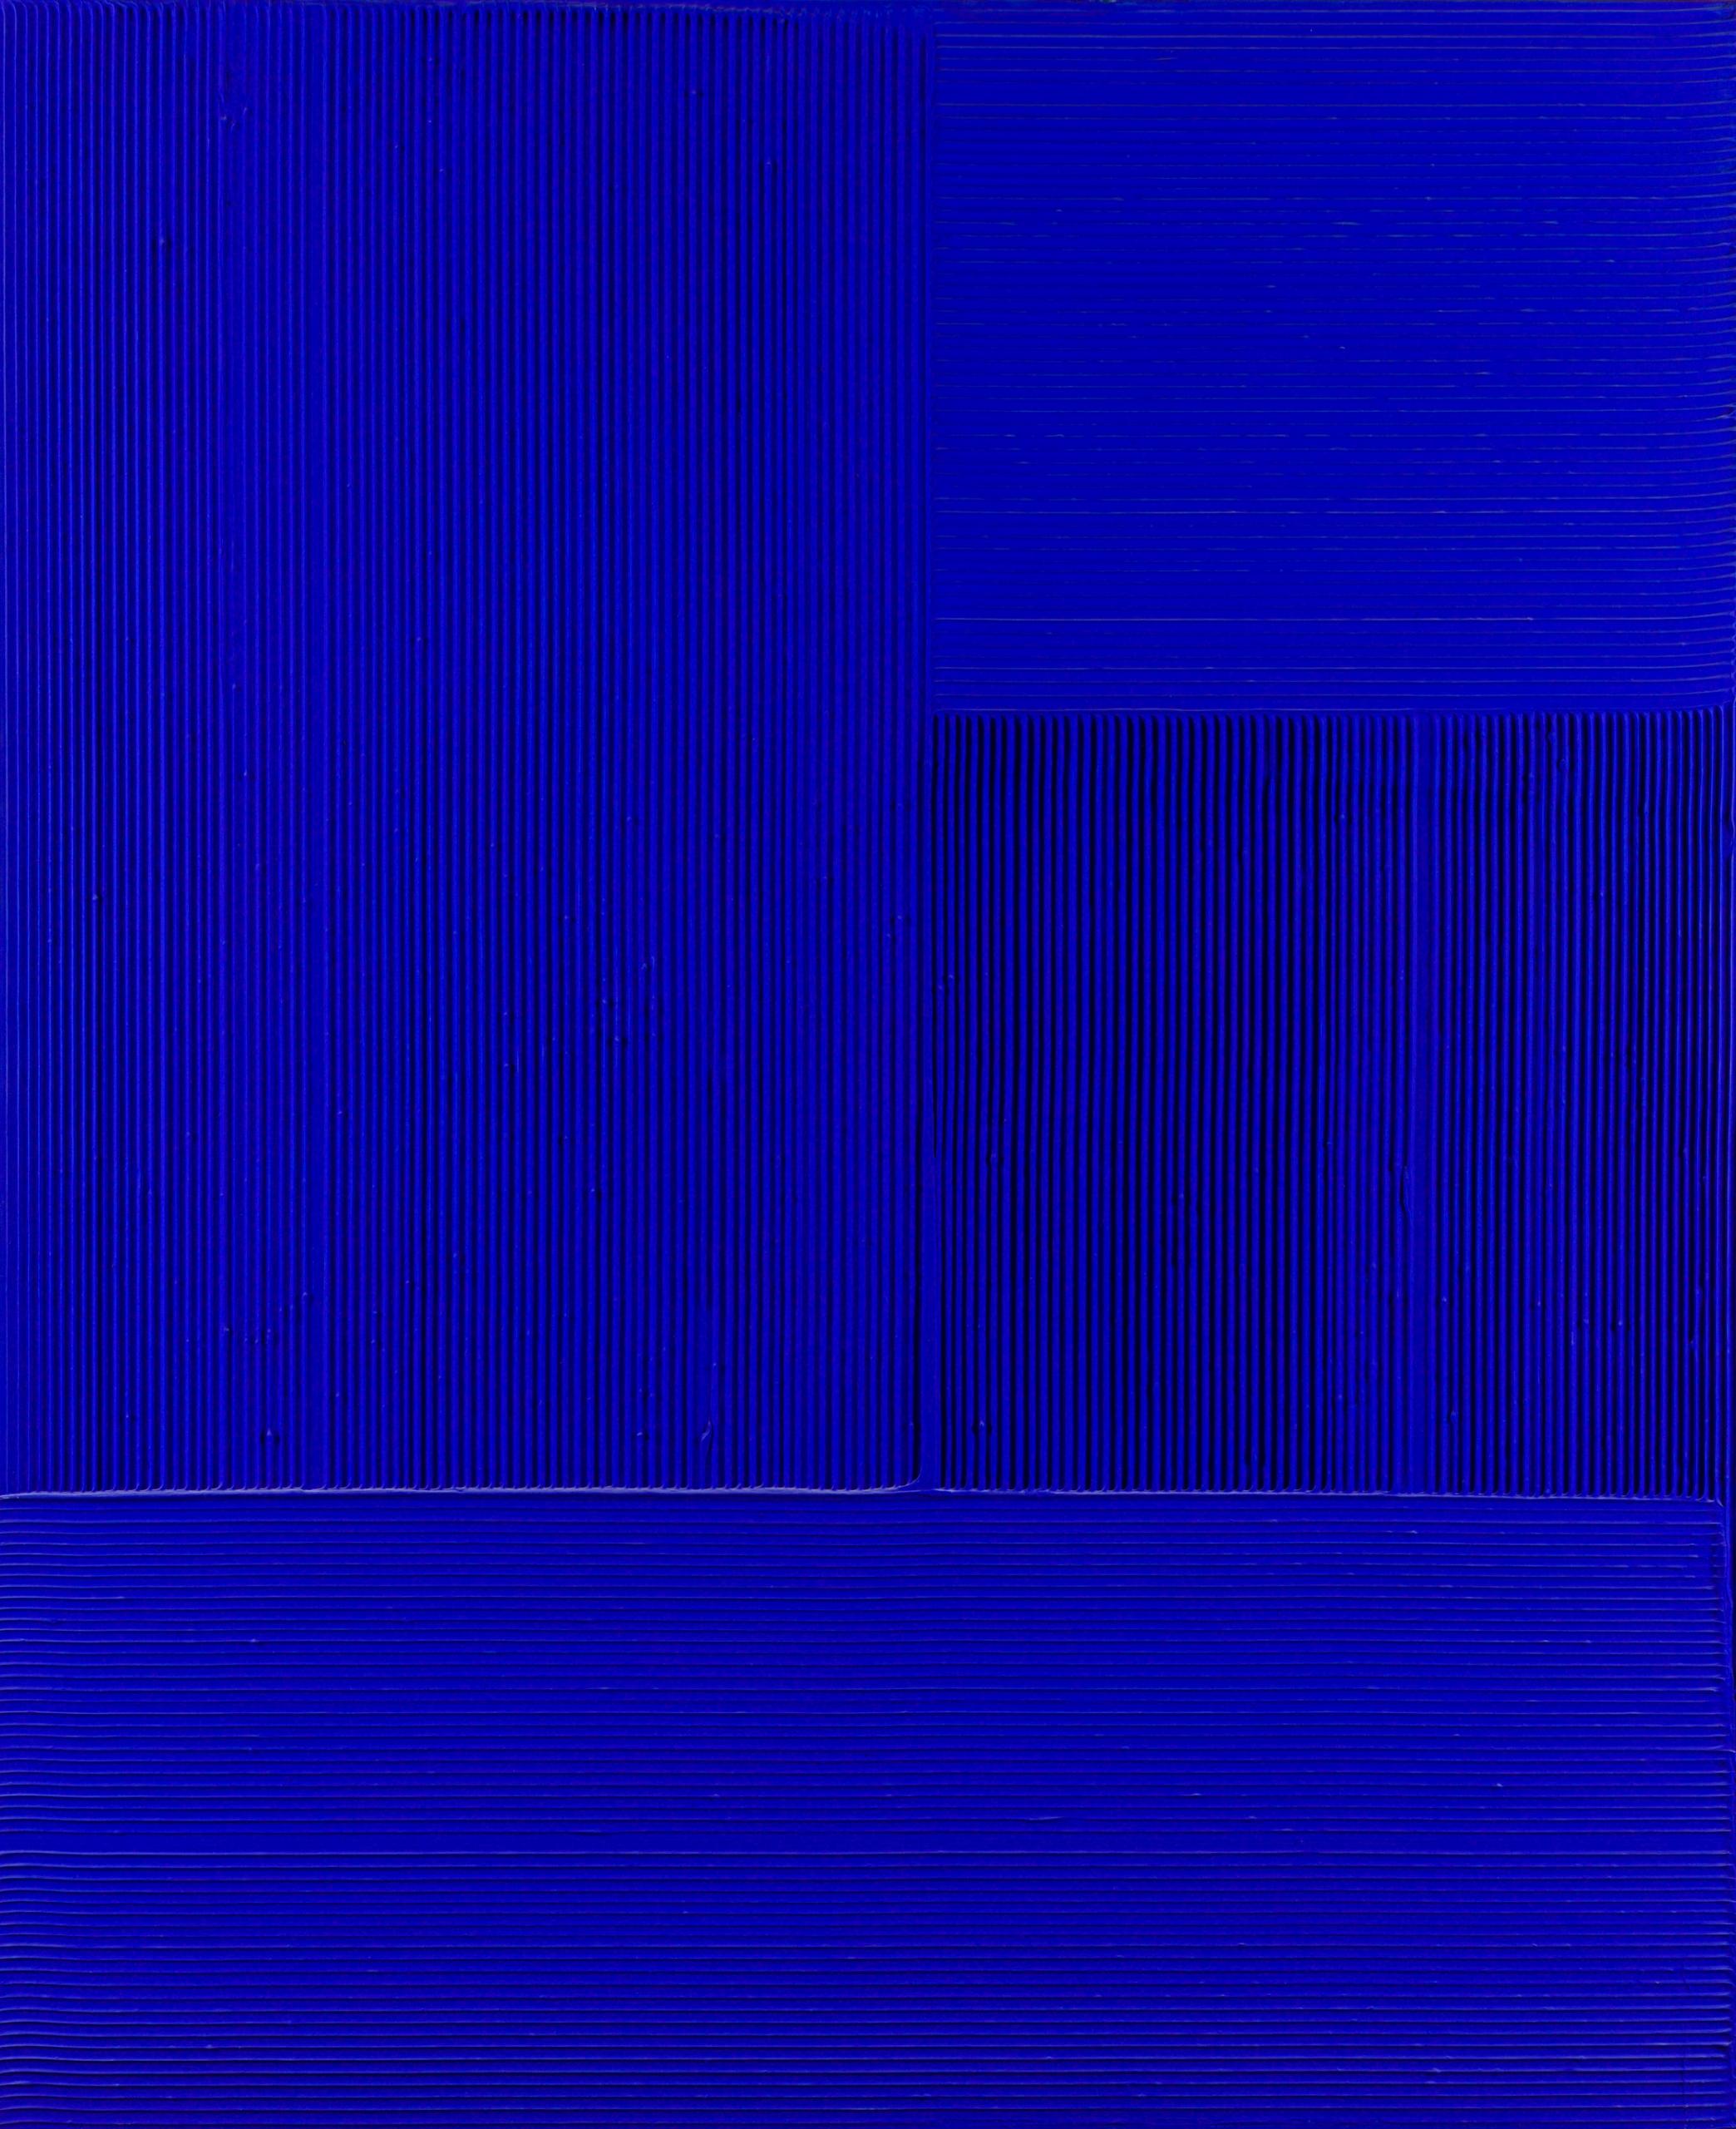 Jakob Gasteiger, Ohne Titel (19.12.2006 Blau)